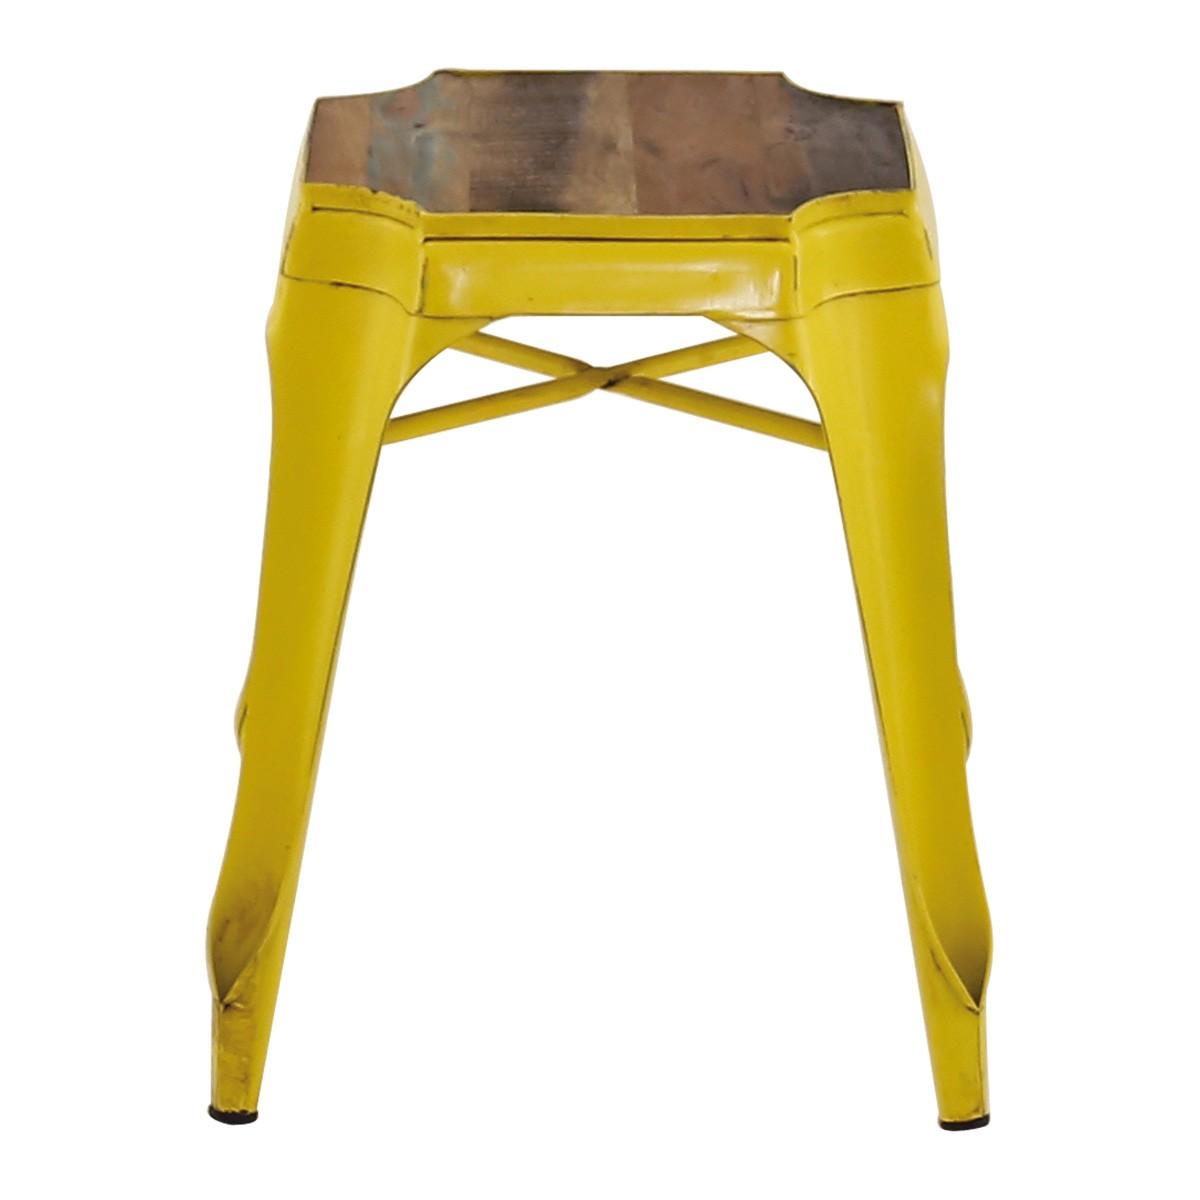 Tabouret industriel jaune